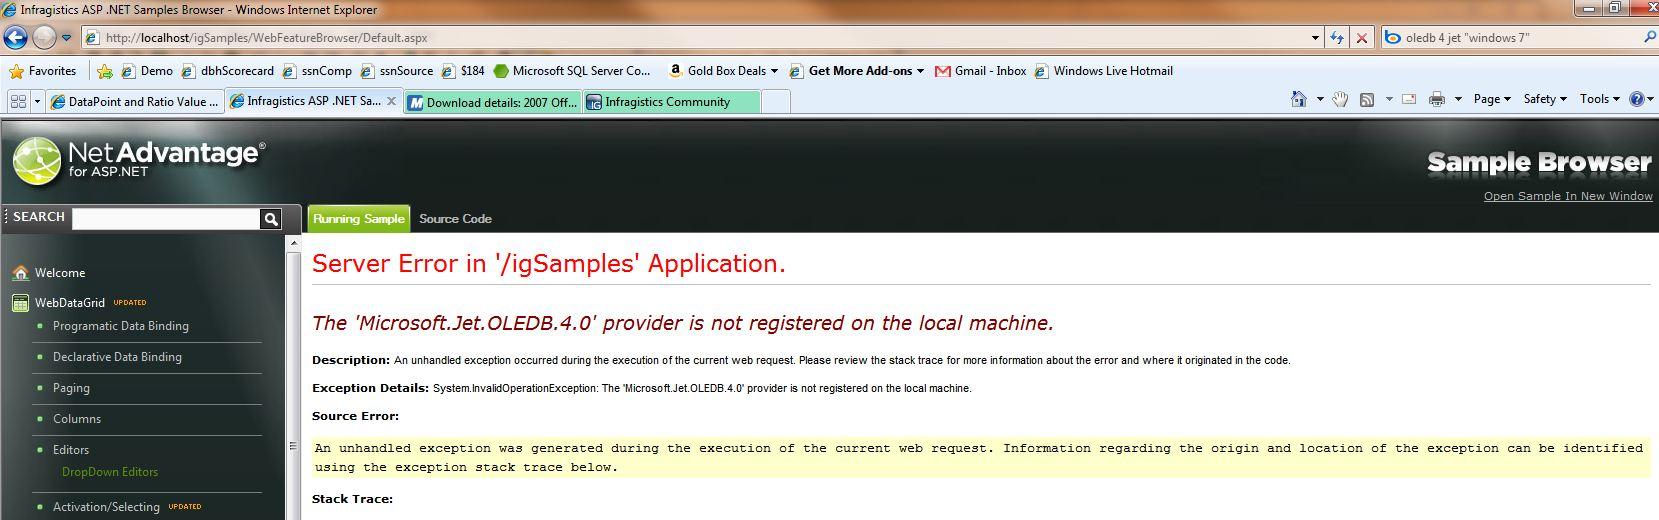 Running Sample Browser Locally - The 'Microsoft Jet OLEDB 4 0